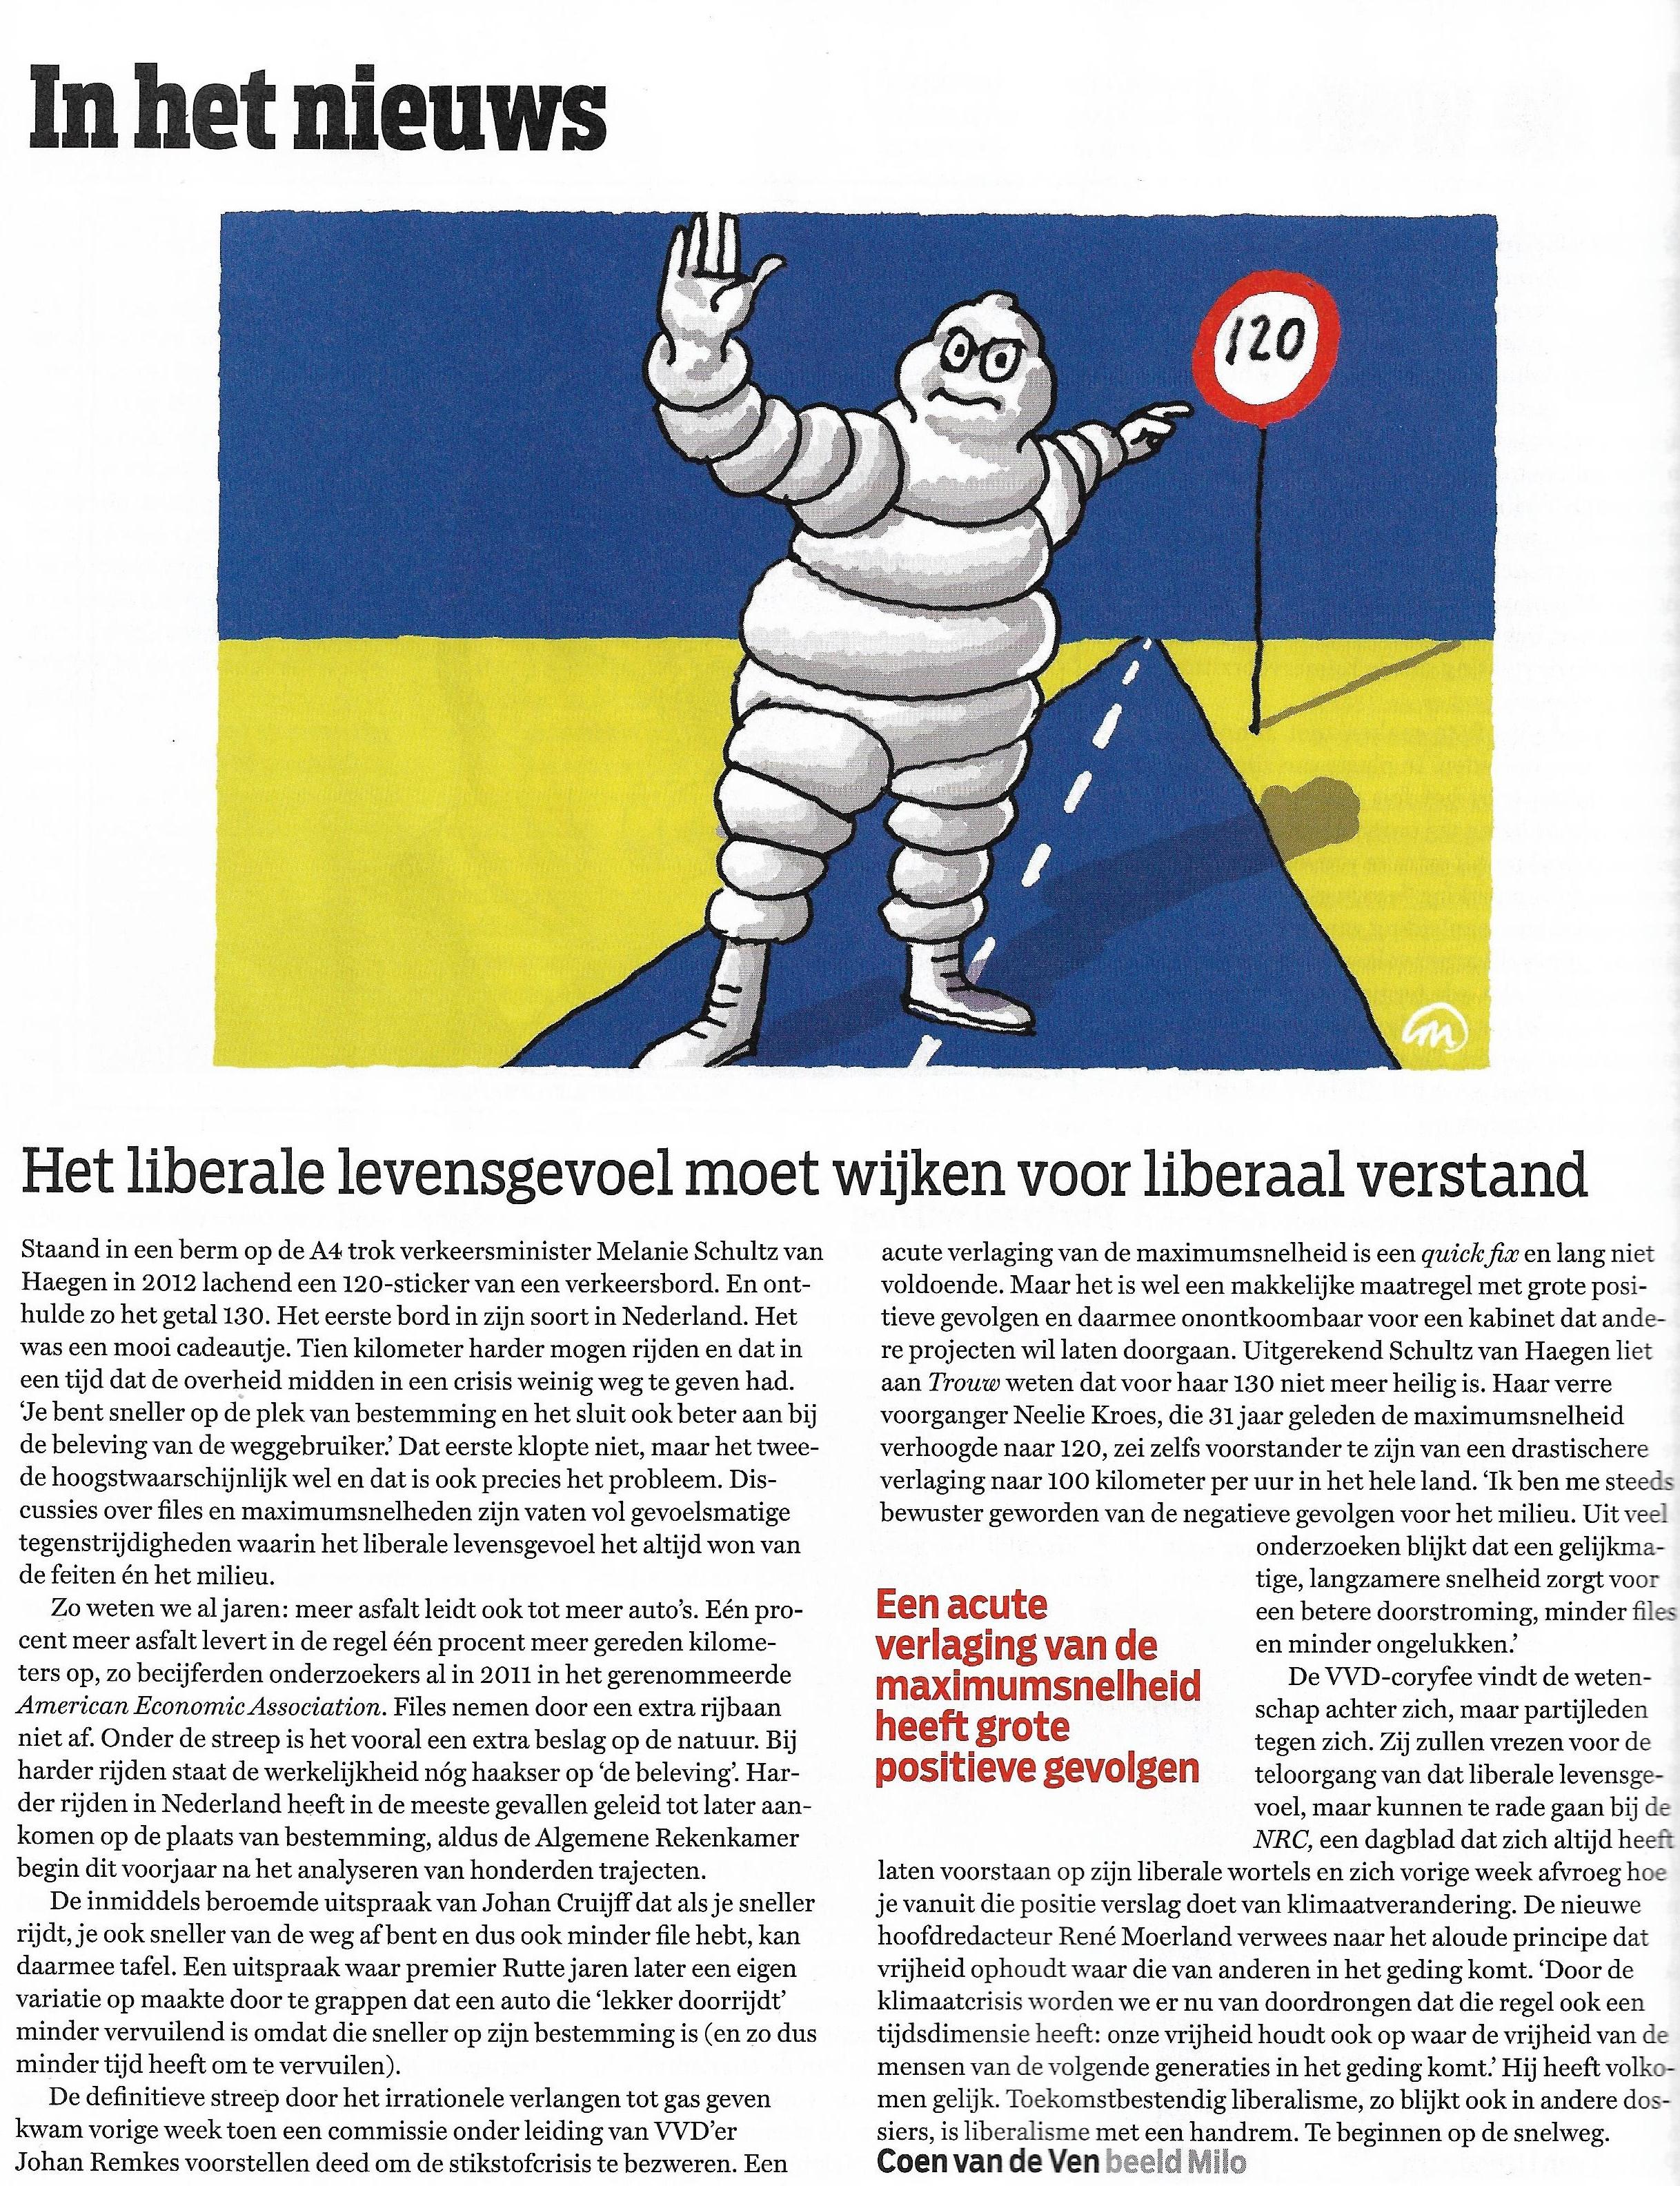 De Groene Amsterdammer 03 oktober 2019